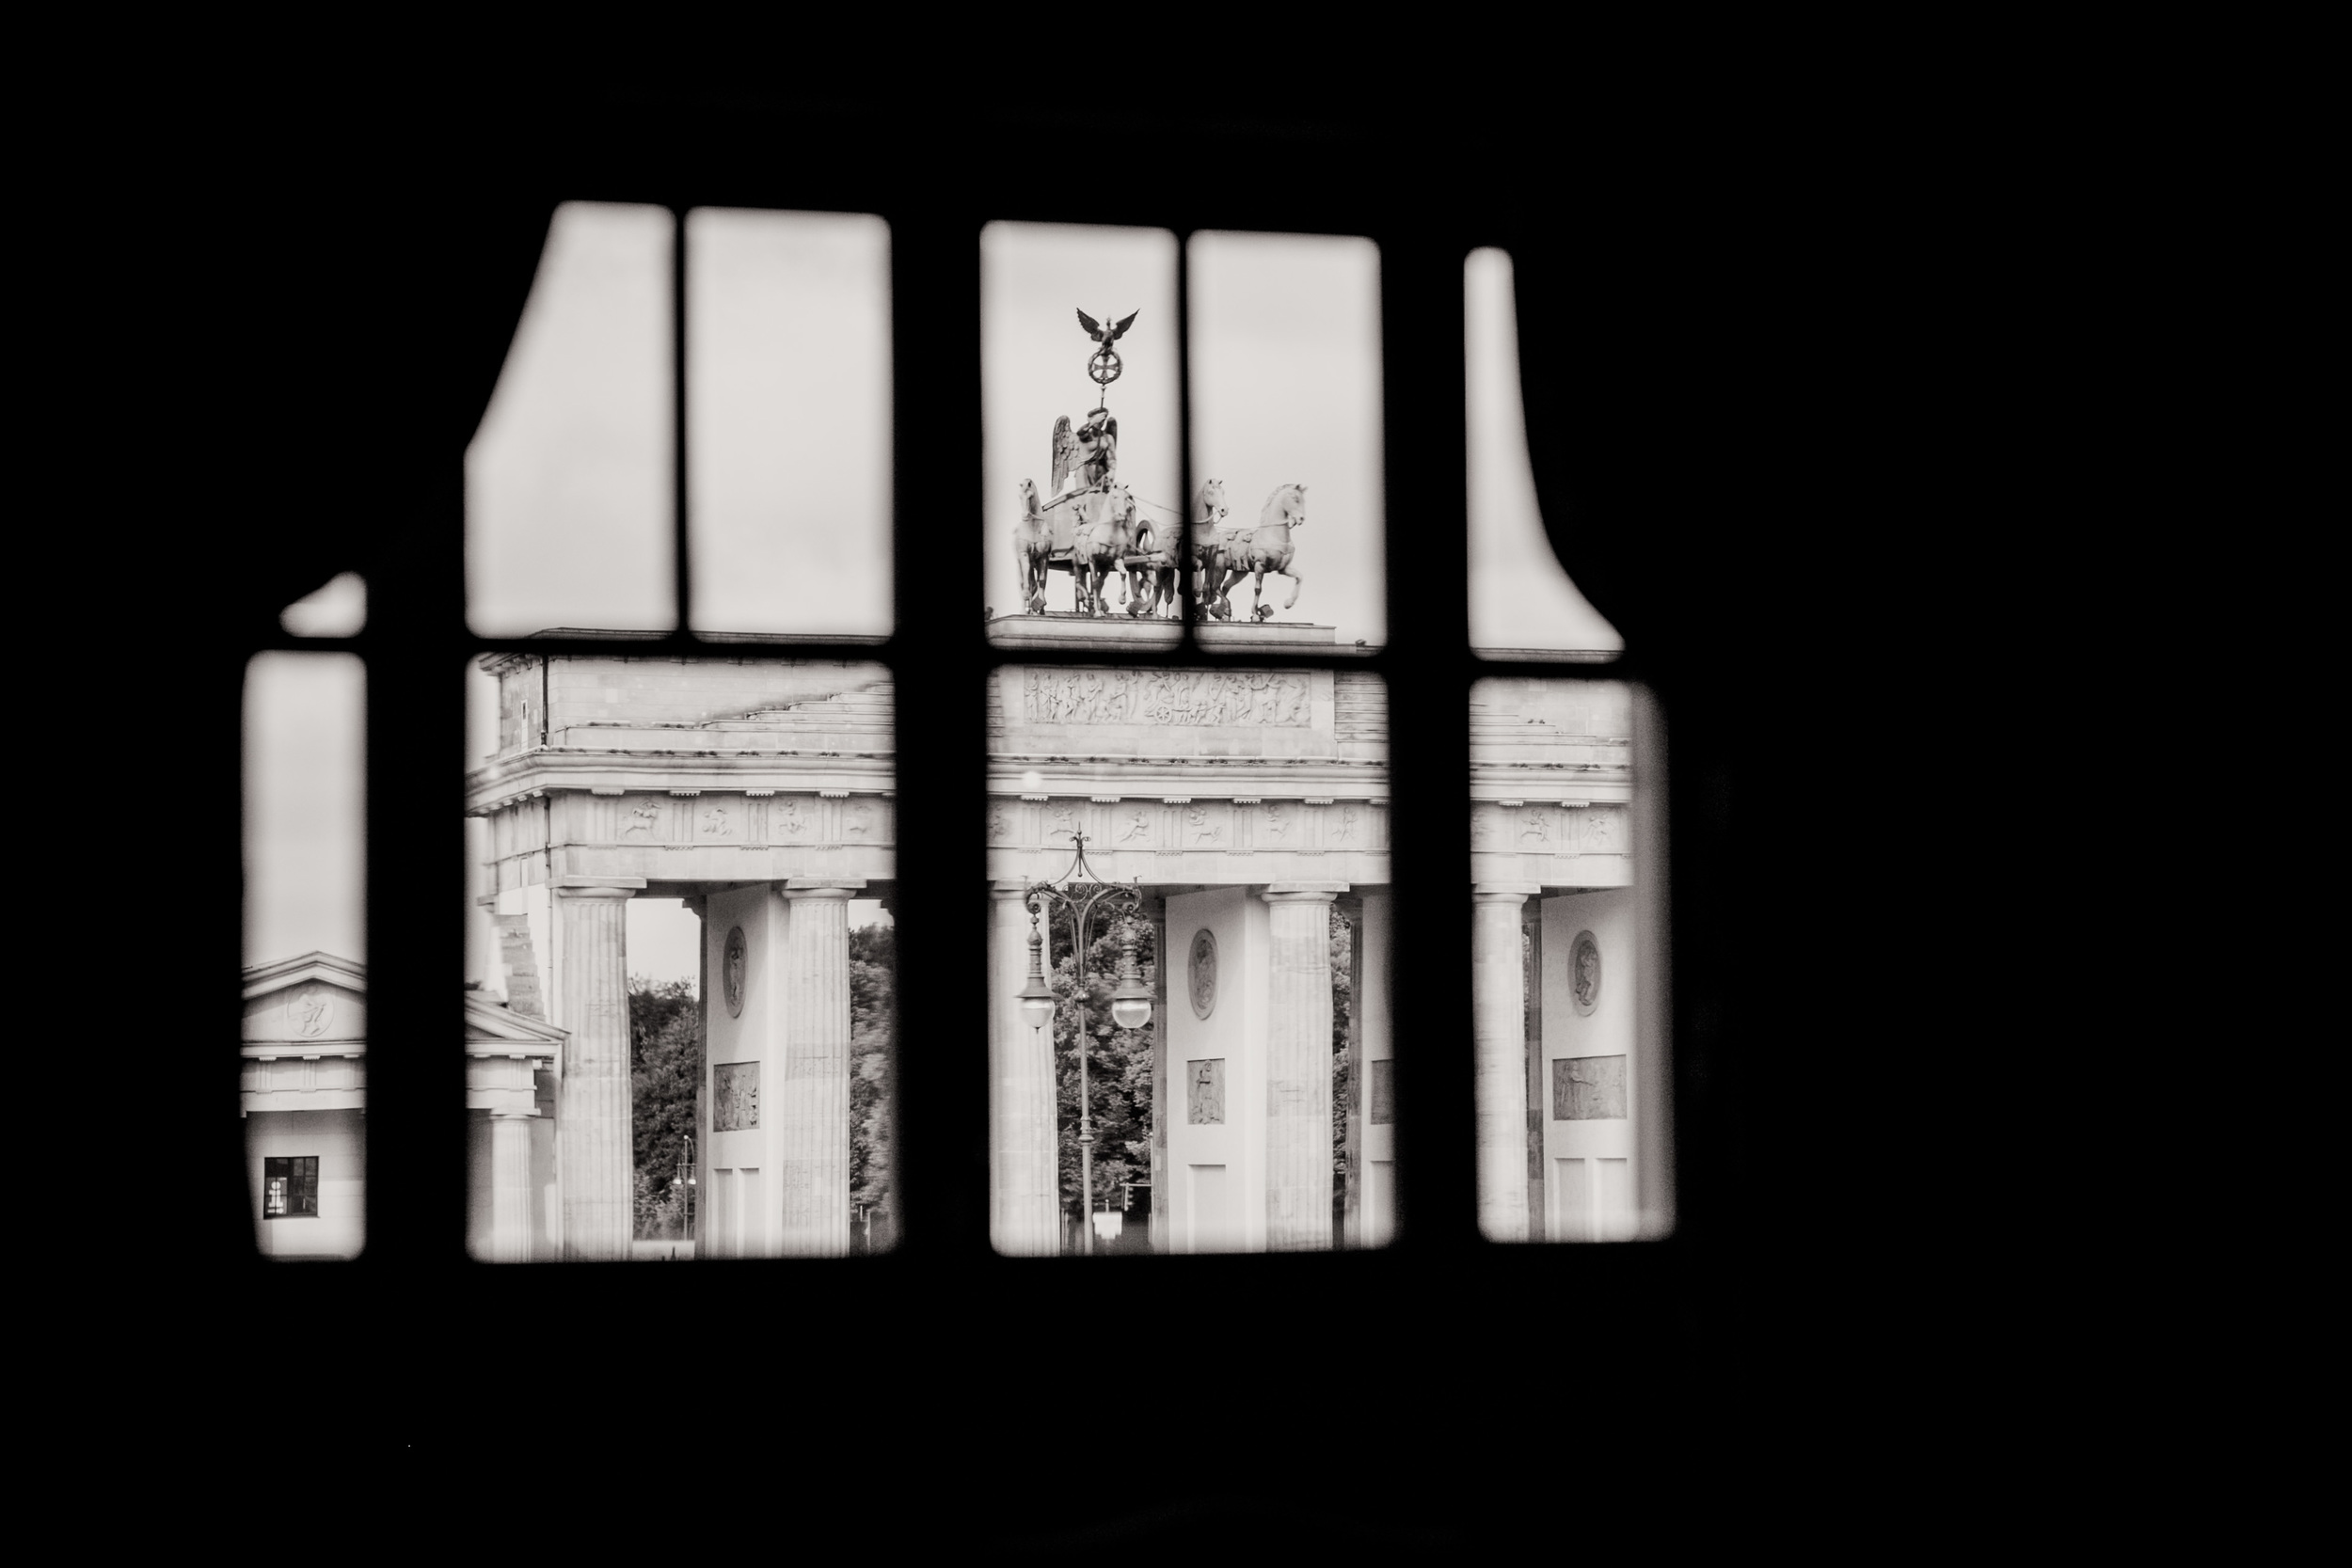 Fran Burrows Hochzeitsfotografie Berlin_Hotel Adlon-37.jpg